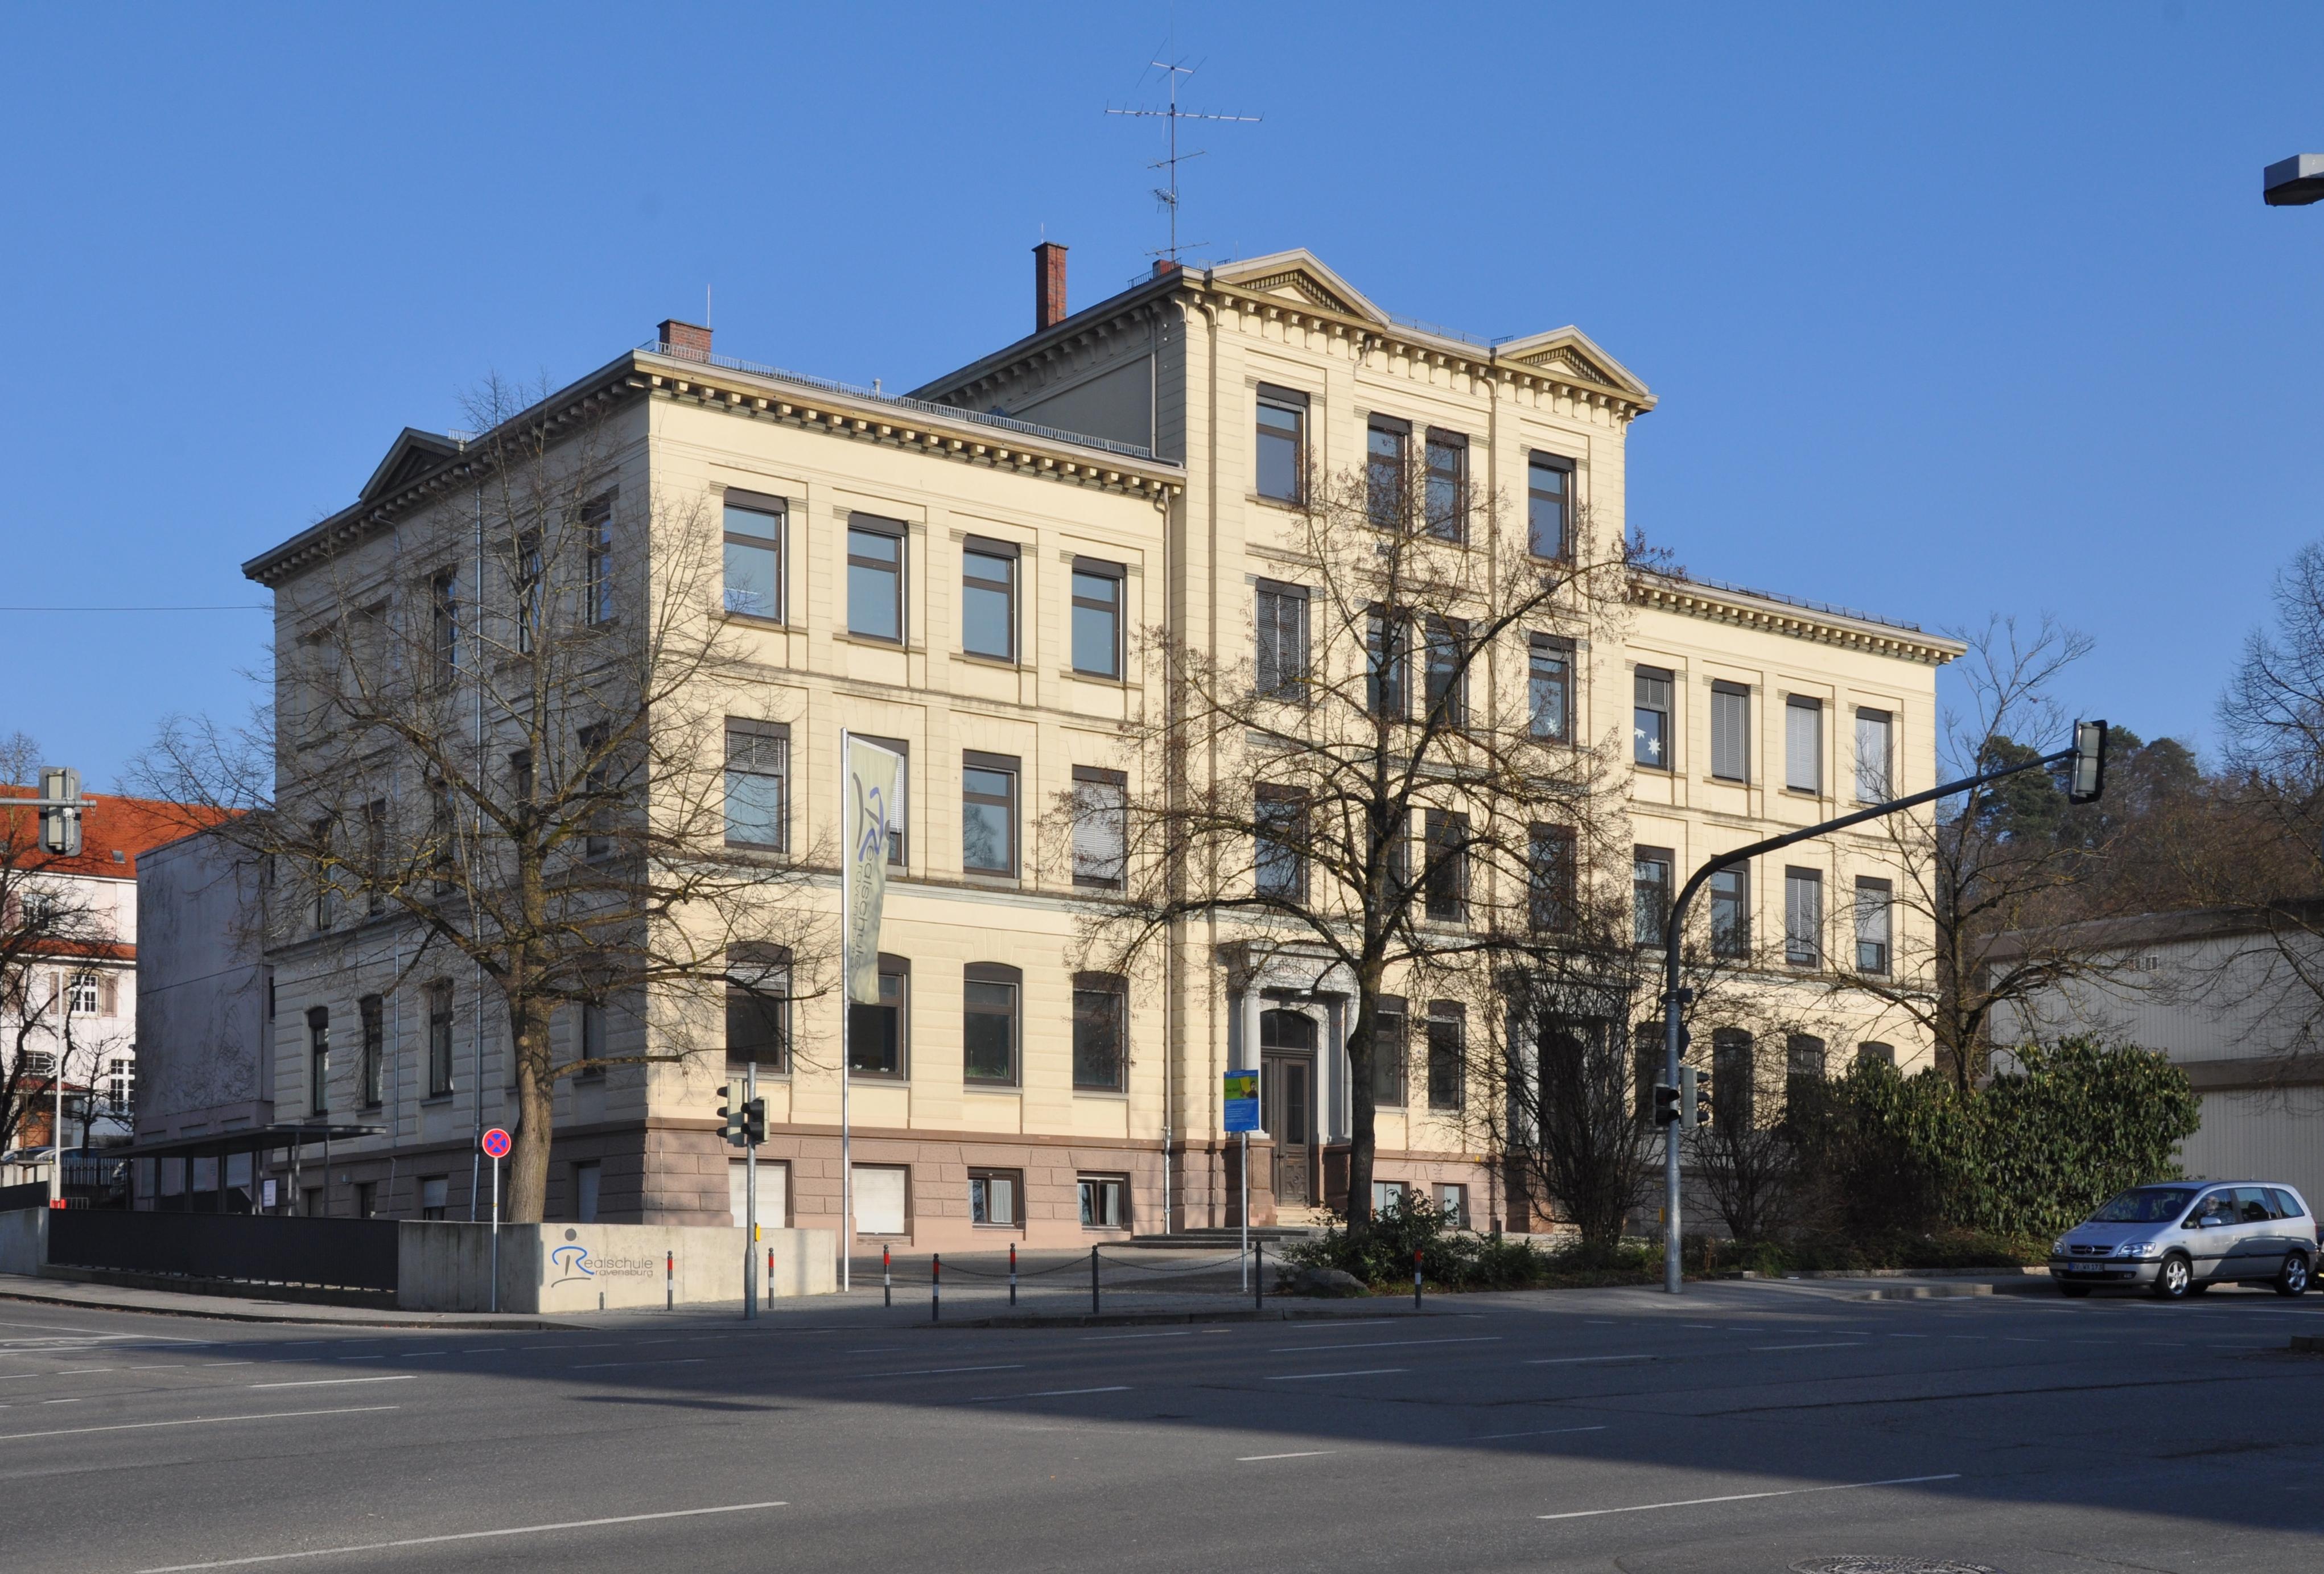 FileRavensburg Realschule 2014